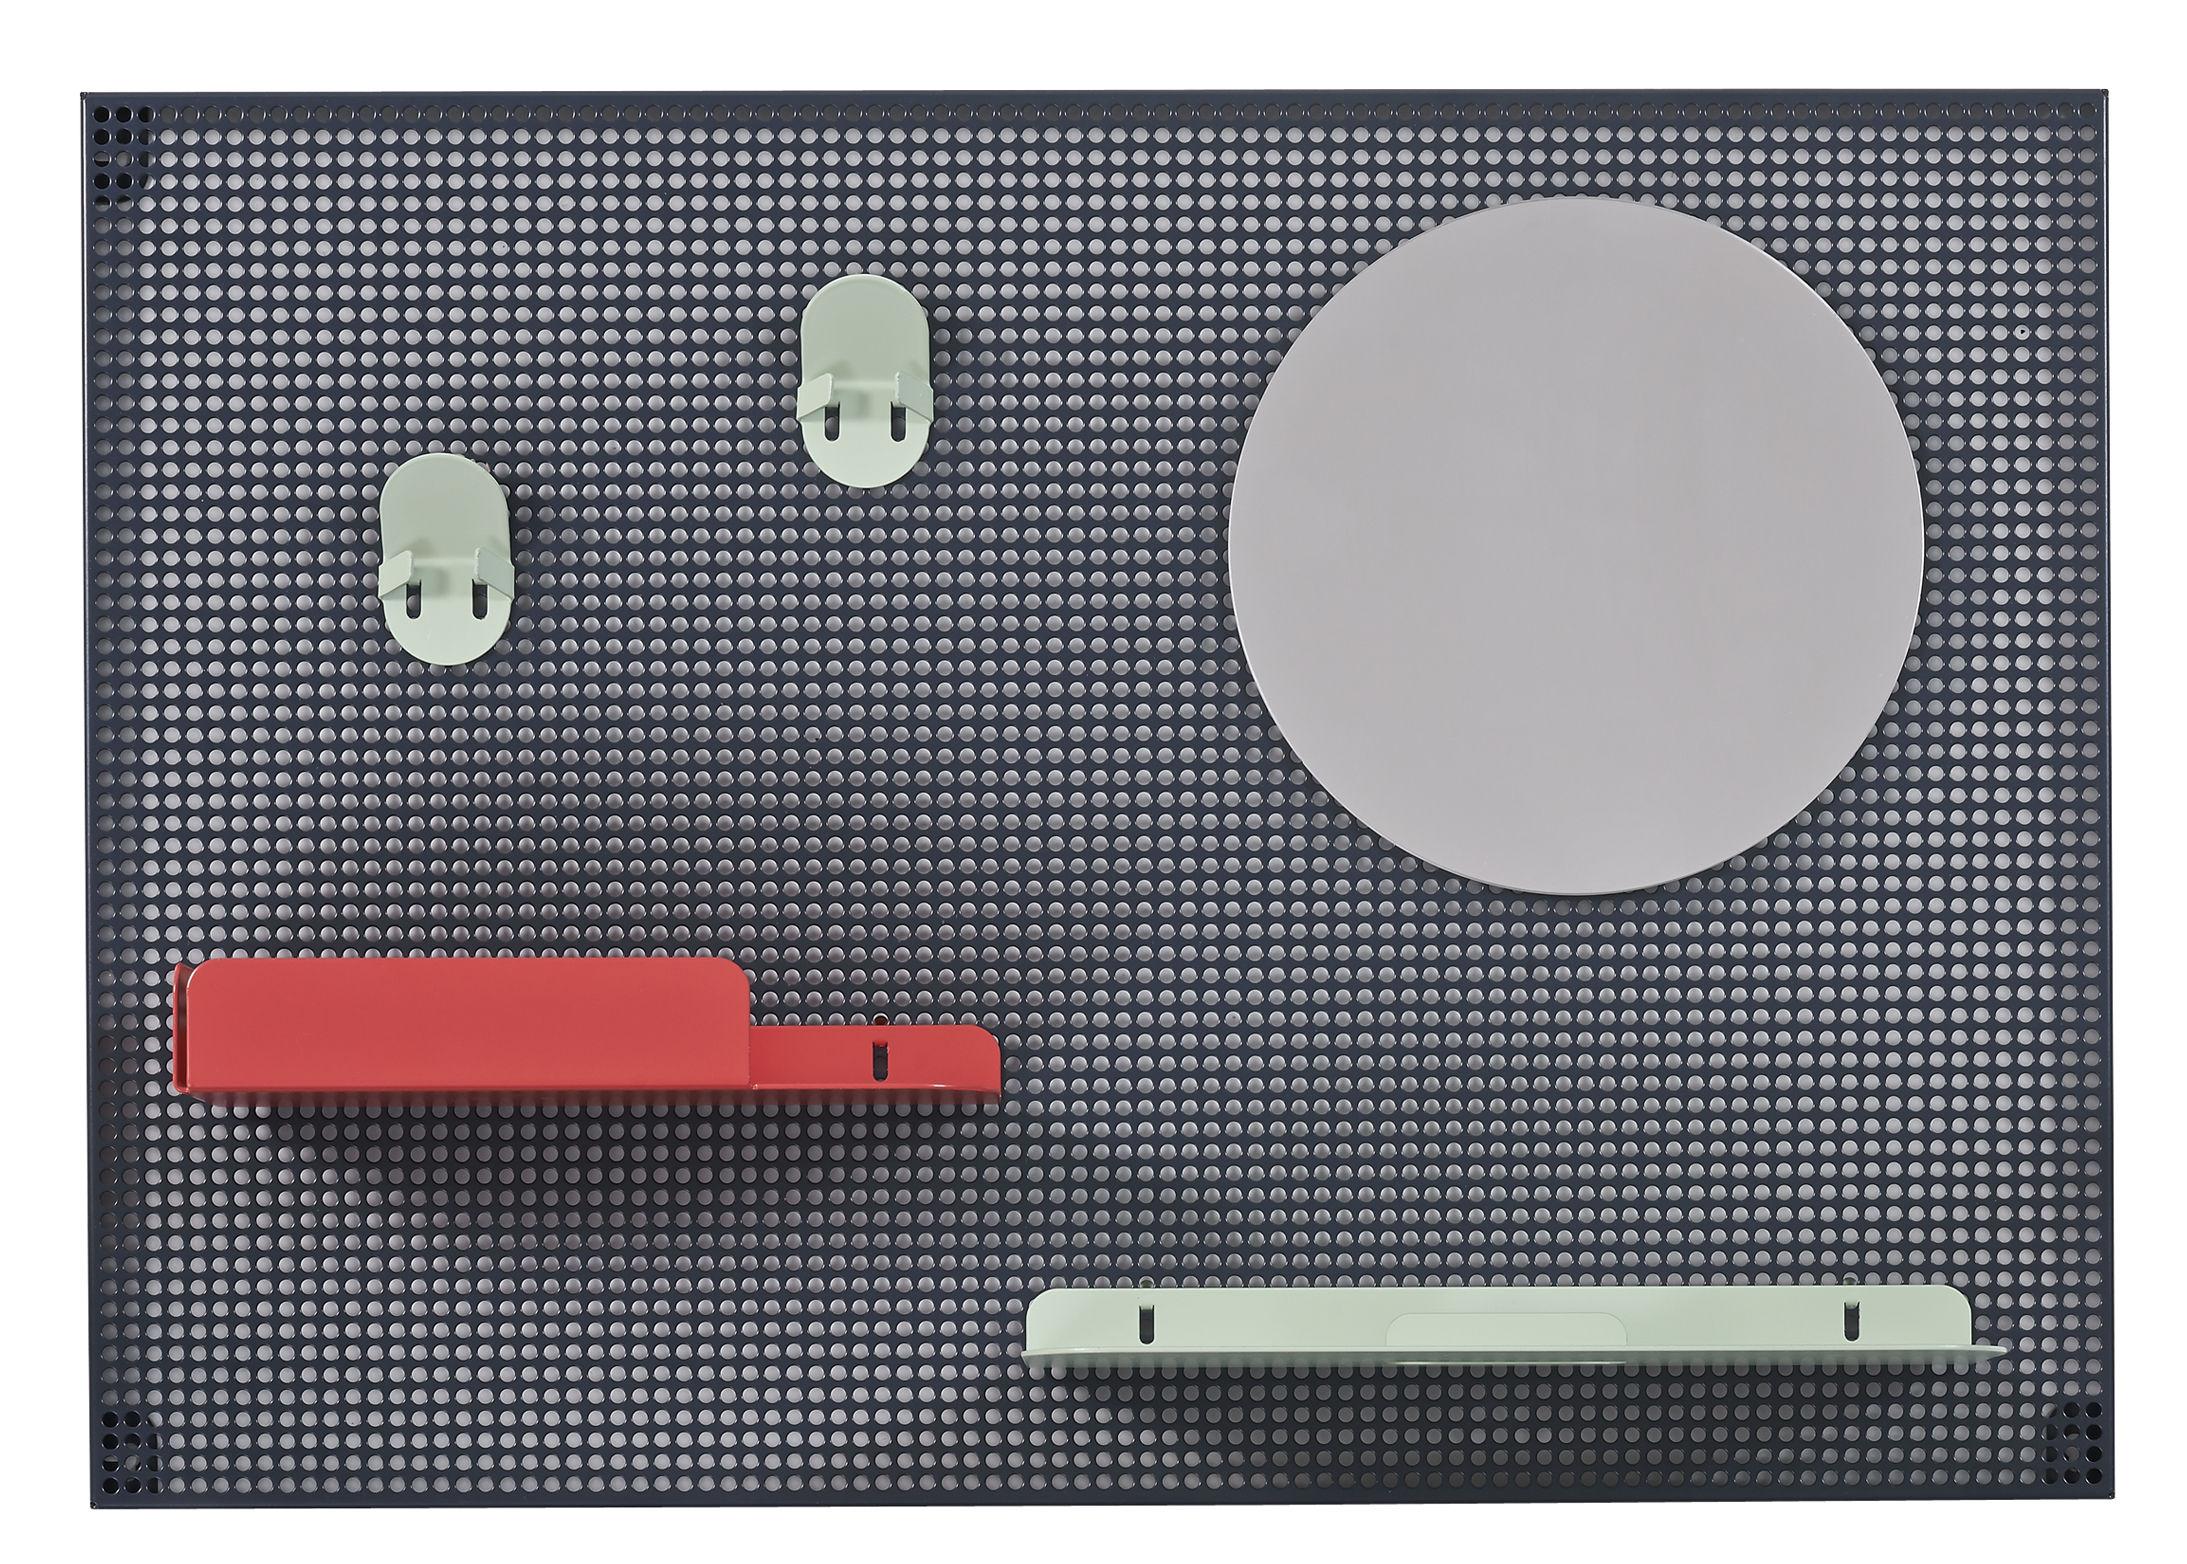 Möbel - Aufbewahrungsmöbel - Alfred Wandablage / 65 x 45 cm - Hartô - Dunkelgrau / erdbeerrot & pastellgrün - Acier perforé, lackiertes Metall